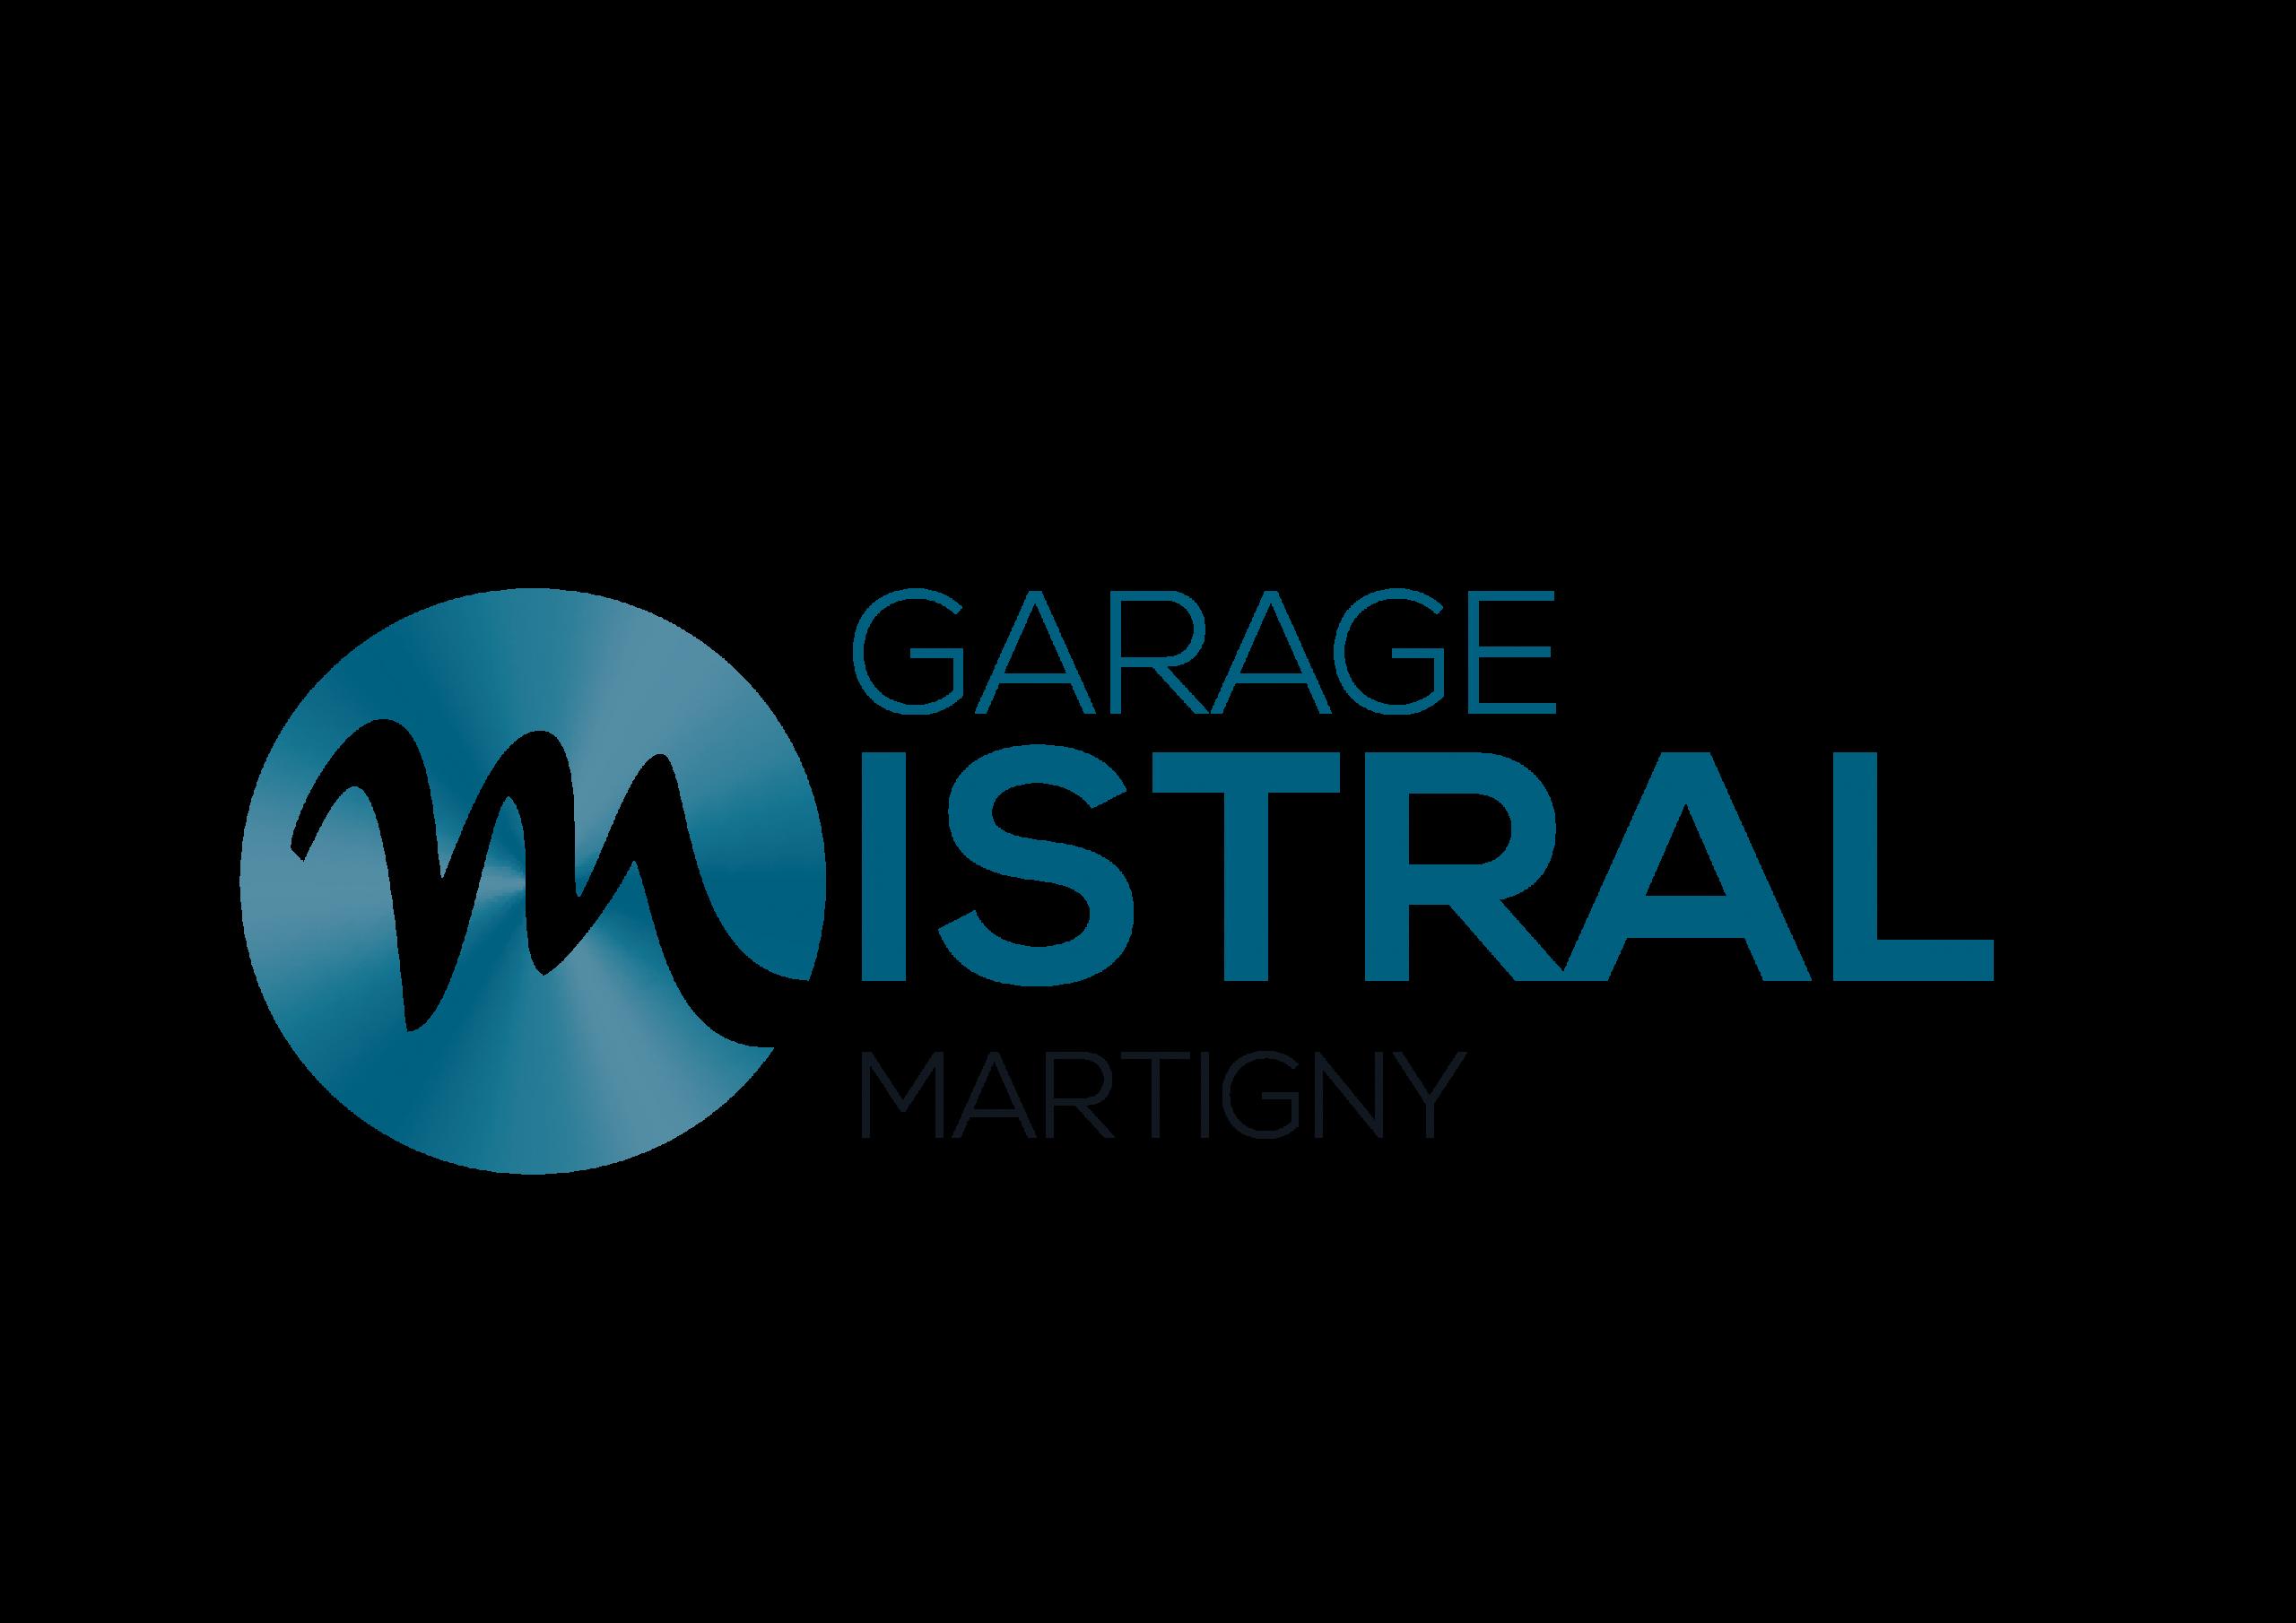 Logo Garage Mistral Martigny